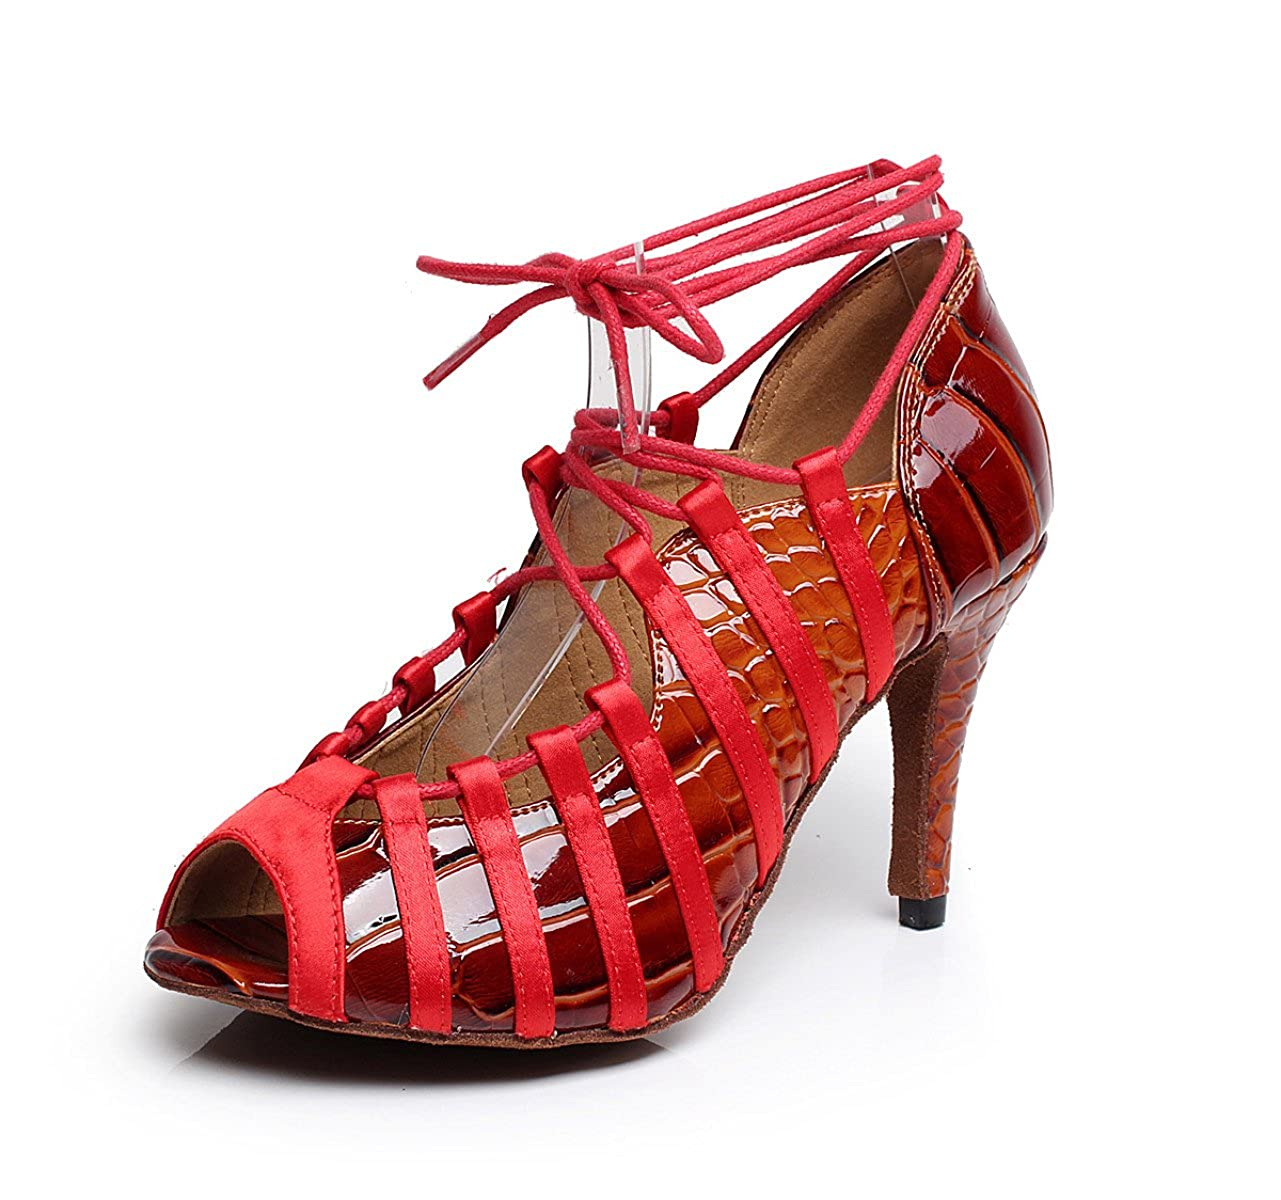 JSHOE Chaussures De PU - Danse Salsa Latin PU Chaussures PU Salsa/Tango/Thé/Samba/Moderne/Jazz Sandales Chaussures Talons Hauts,Red-heeled8.5cm-UK4/EU35/Our36 - 4594ab7 - boatplans.space